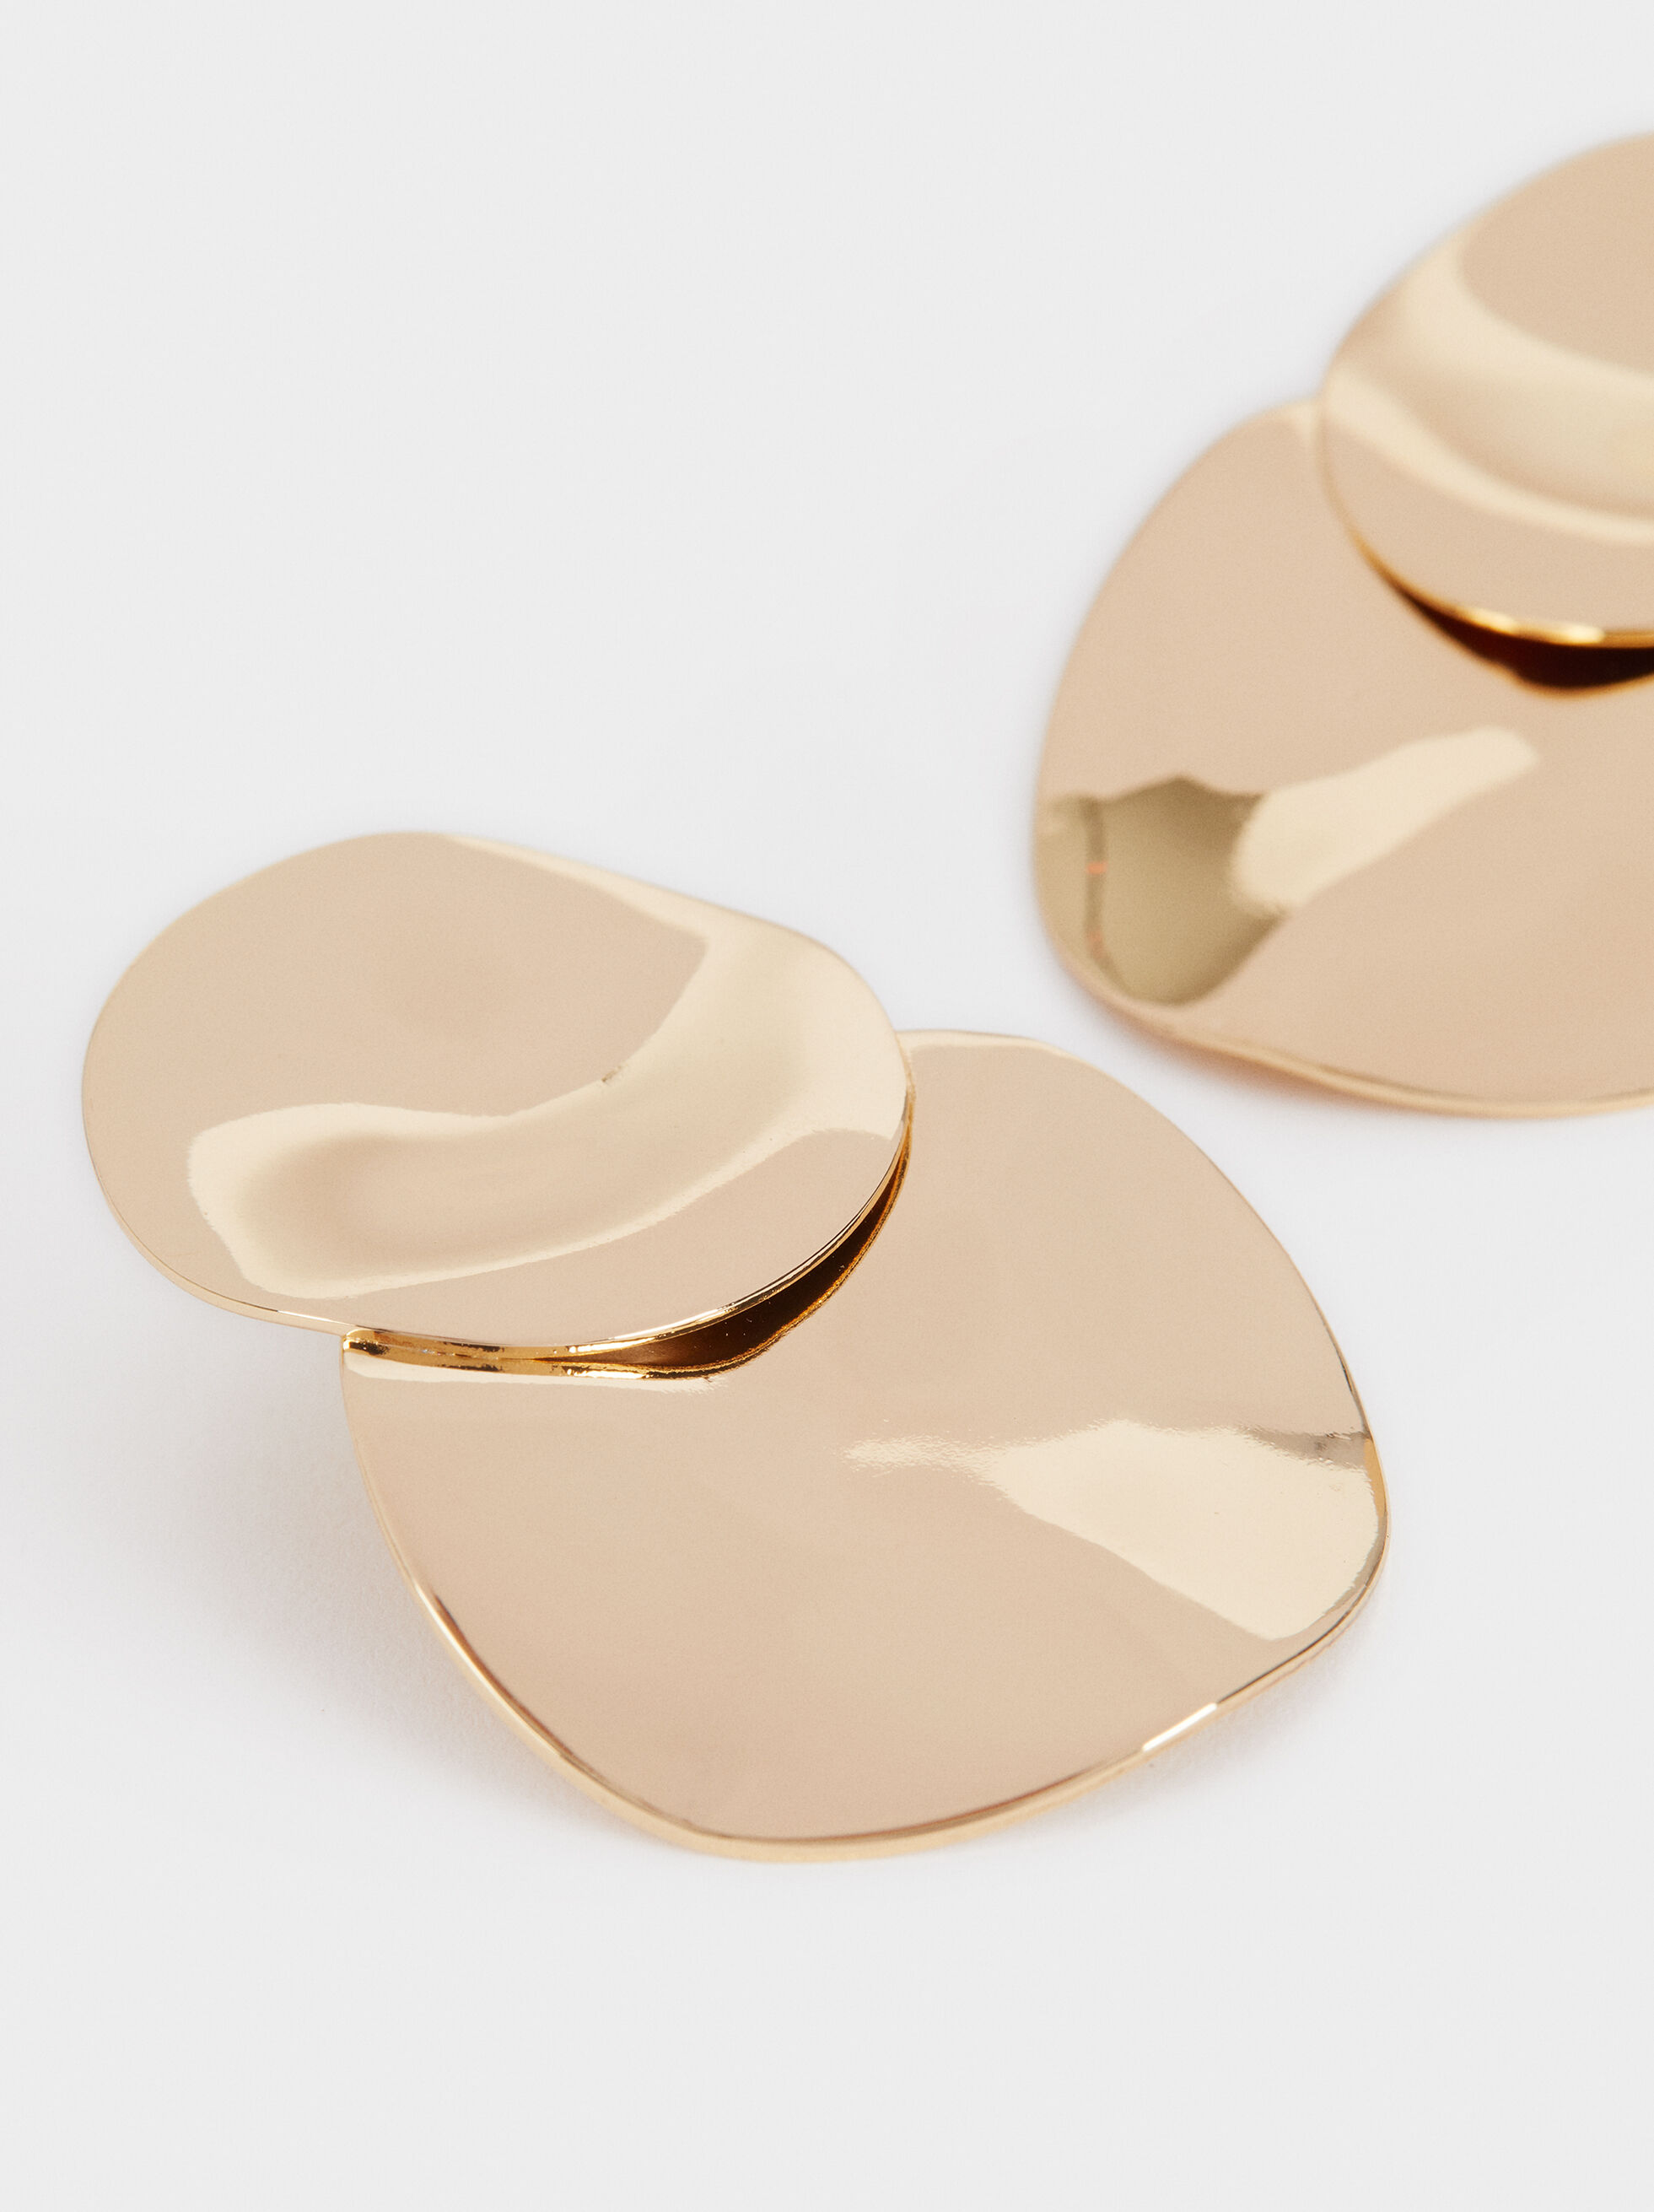 Long Gold Earrings, Golden, hi-res